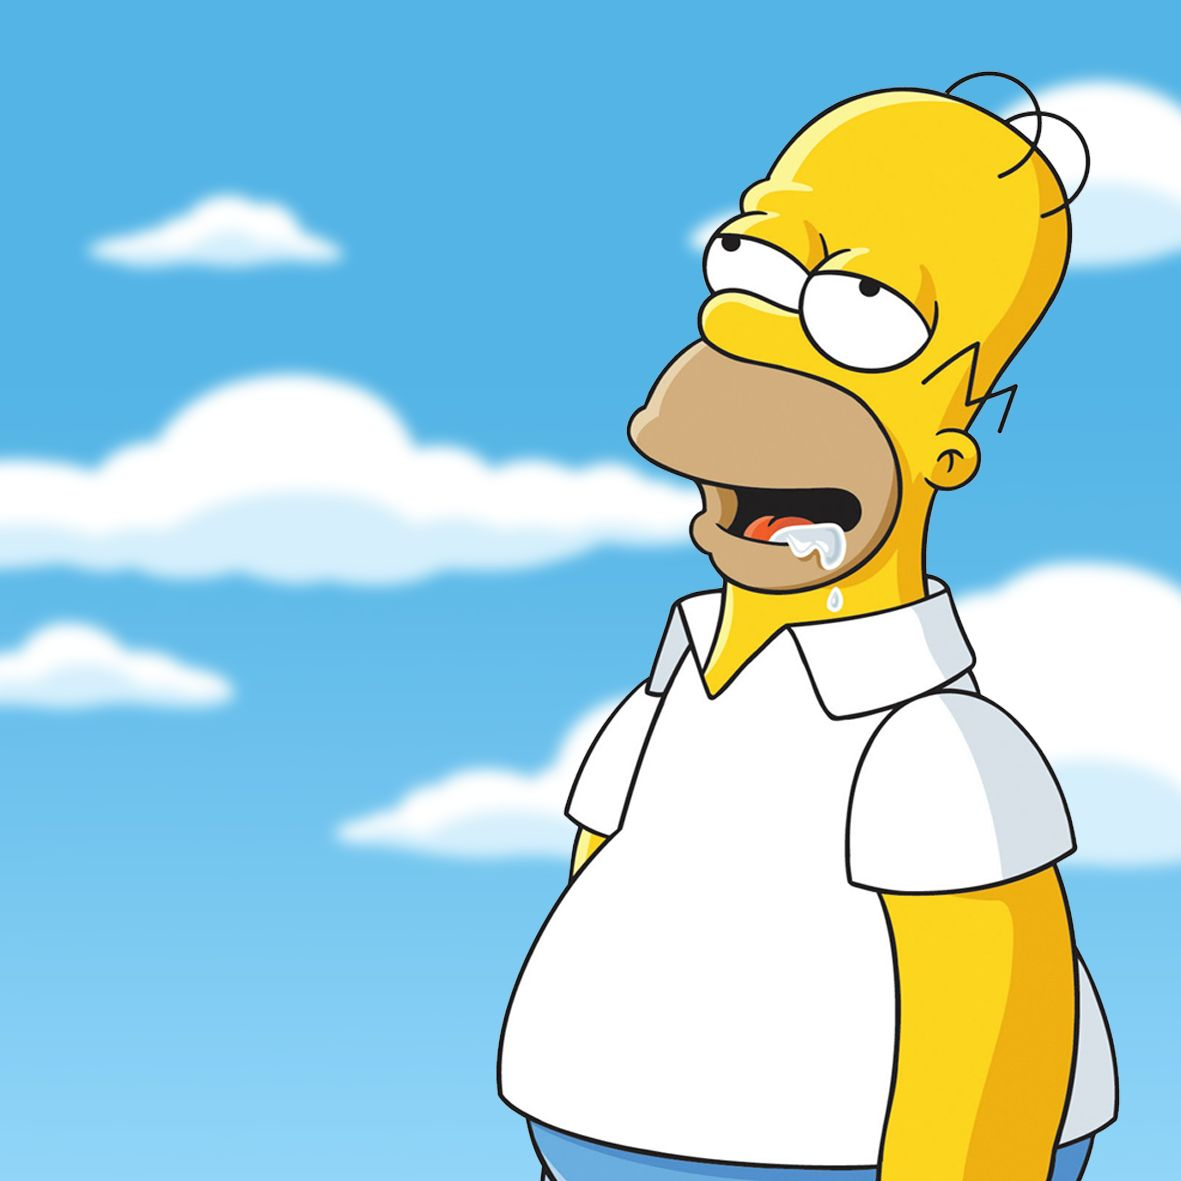 Homer Simpson Drooling Mmm Meme Meme Generator - Imgflip